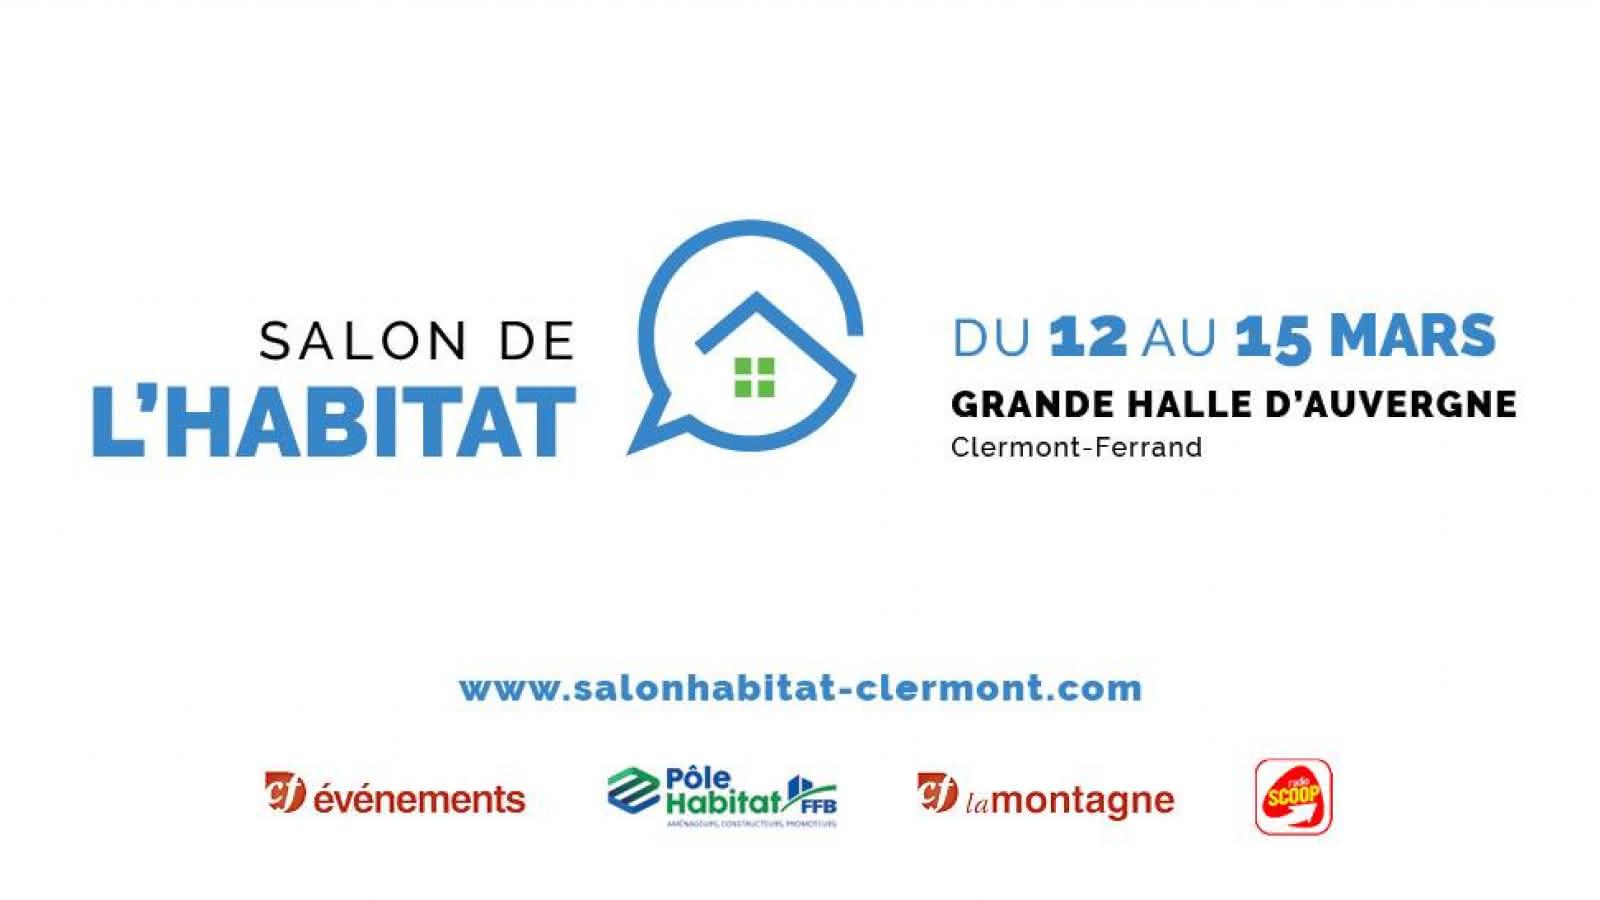 © Salon de l'habitat